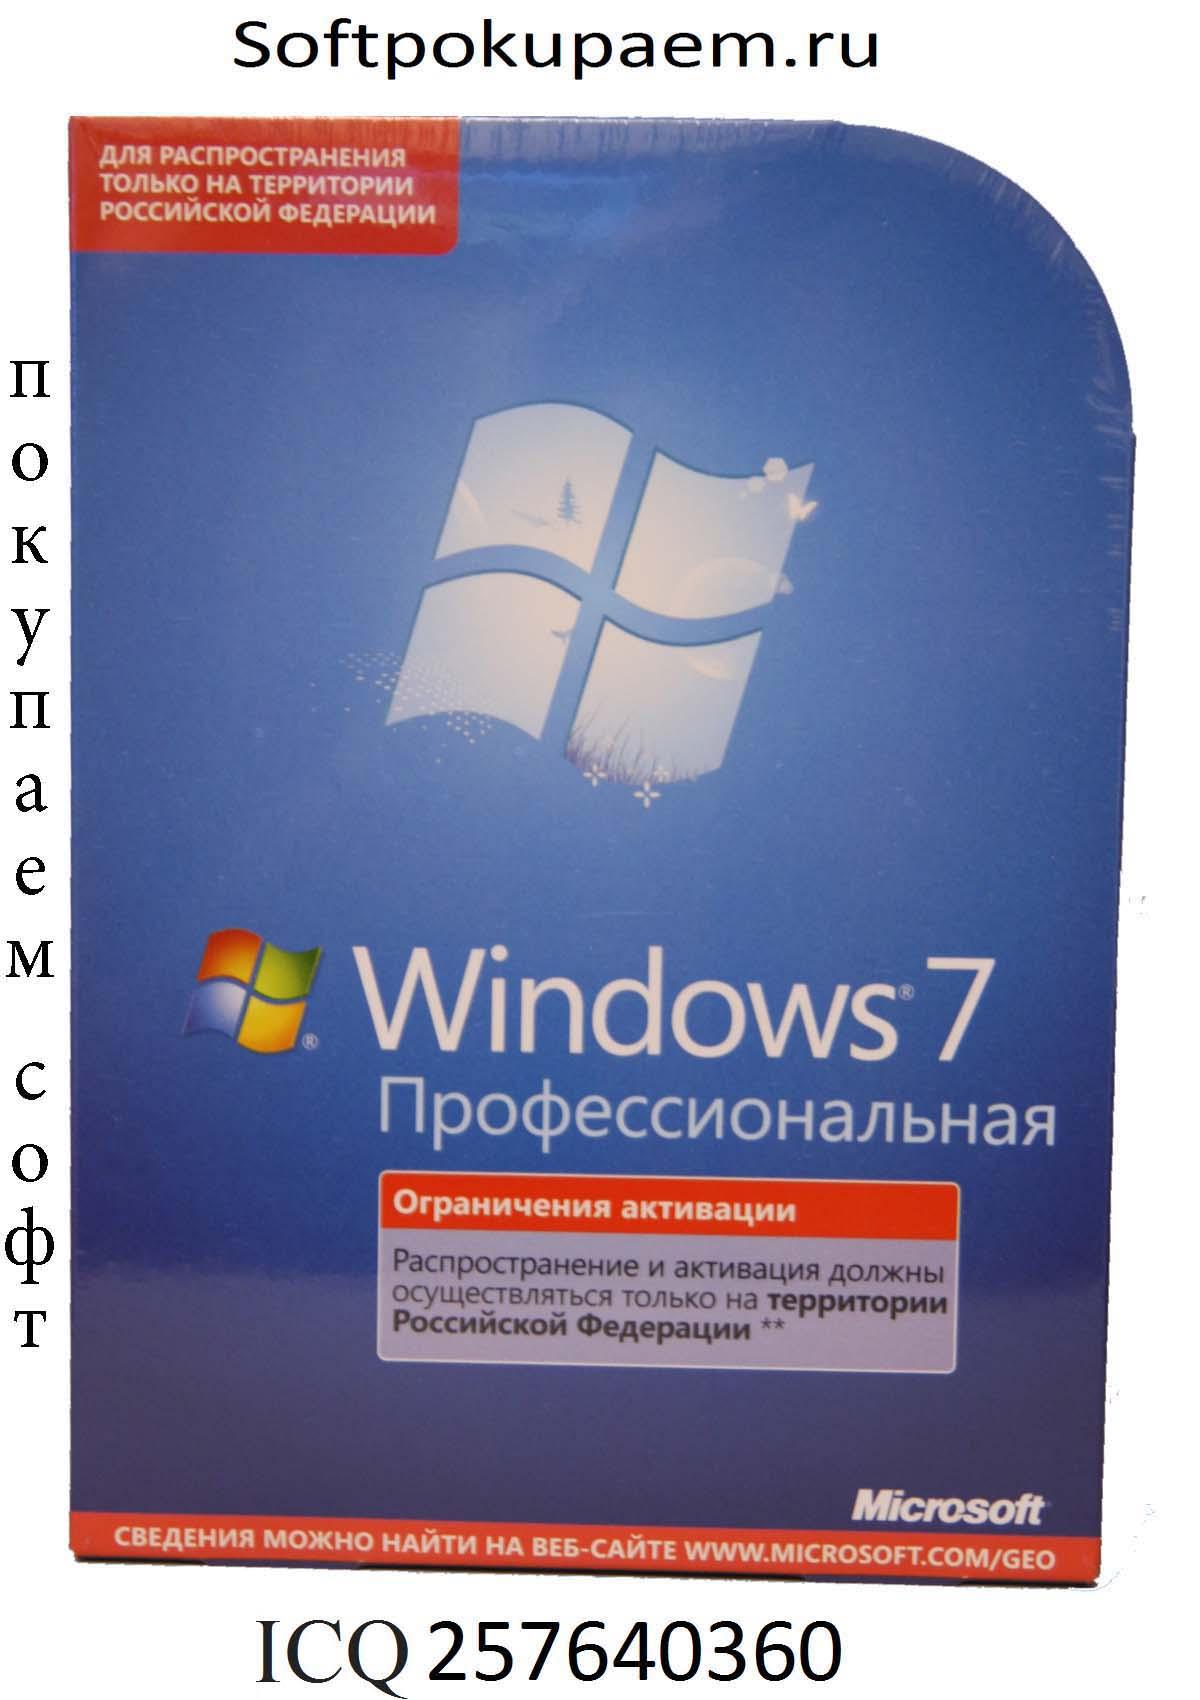 Скупим софт, ПО от Майкрософт